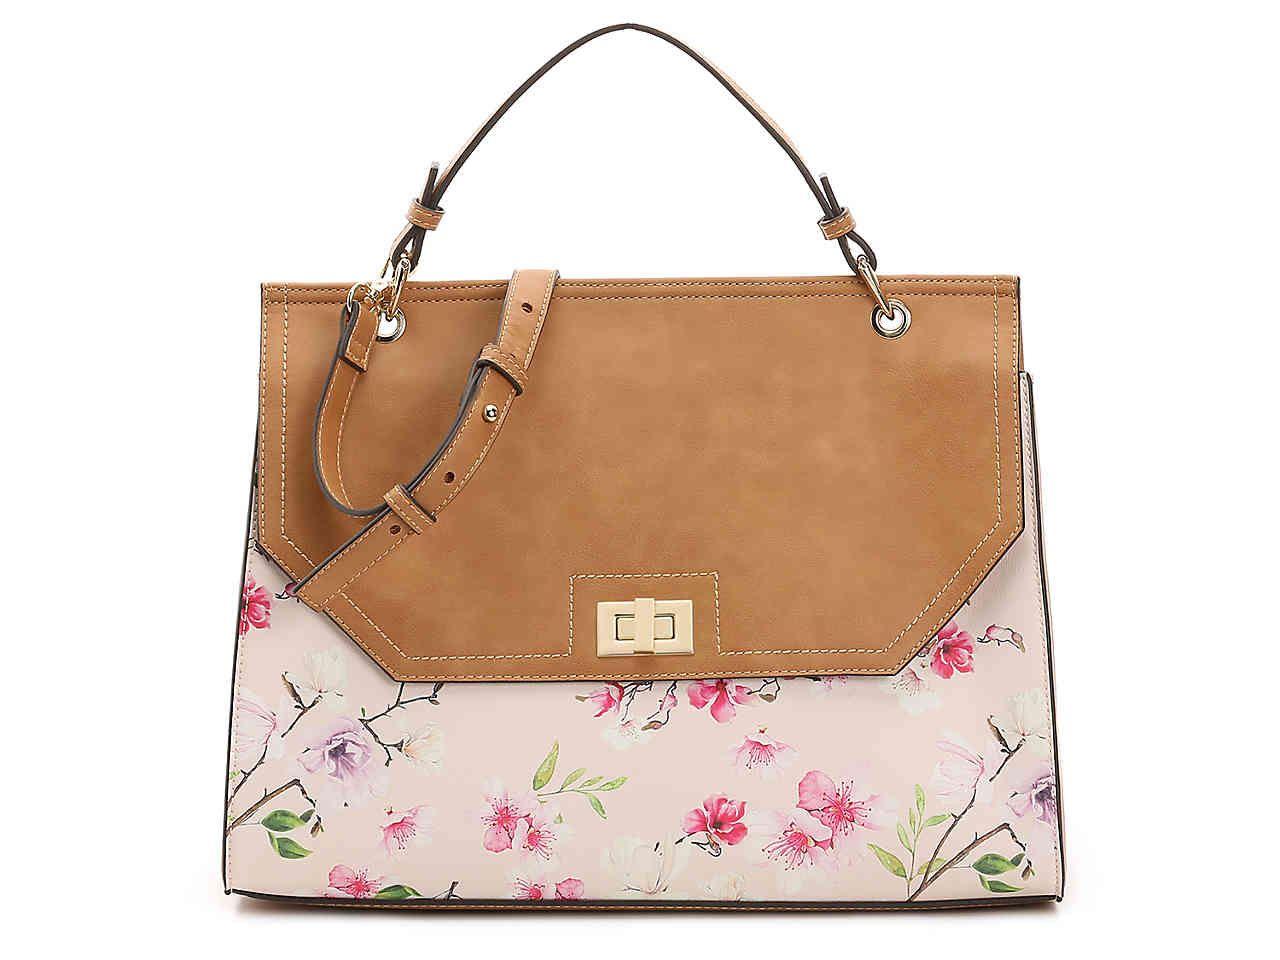 f52b9a4c291 Women Buffet Satchel -Taupe | Plus Size Spring/Summer Fashion ...